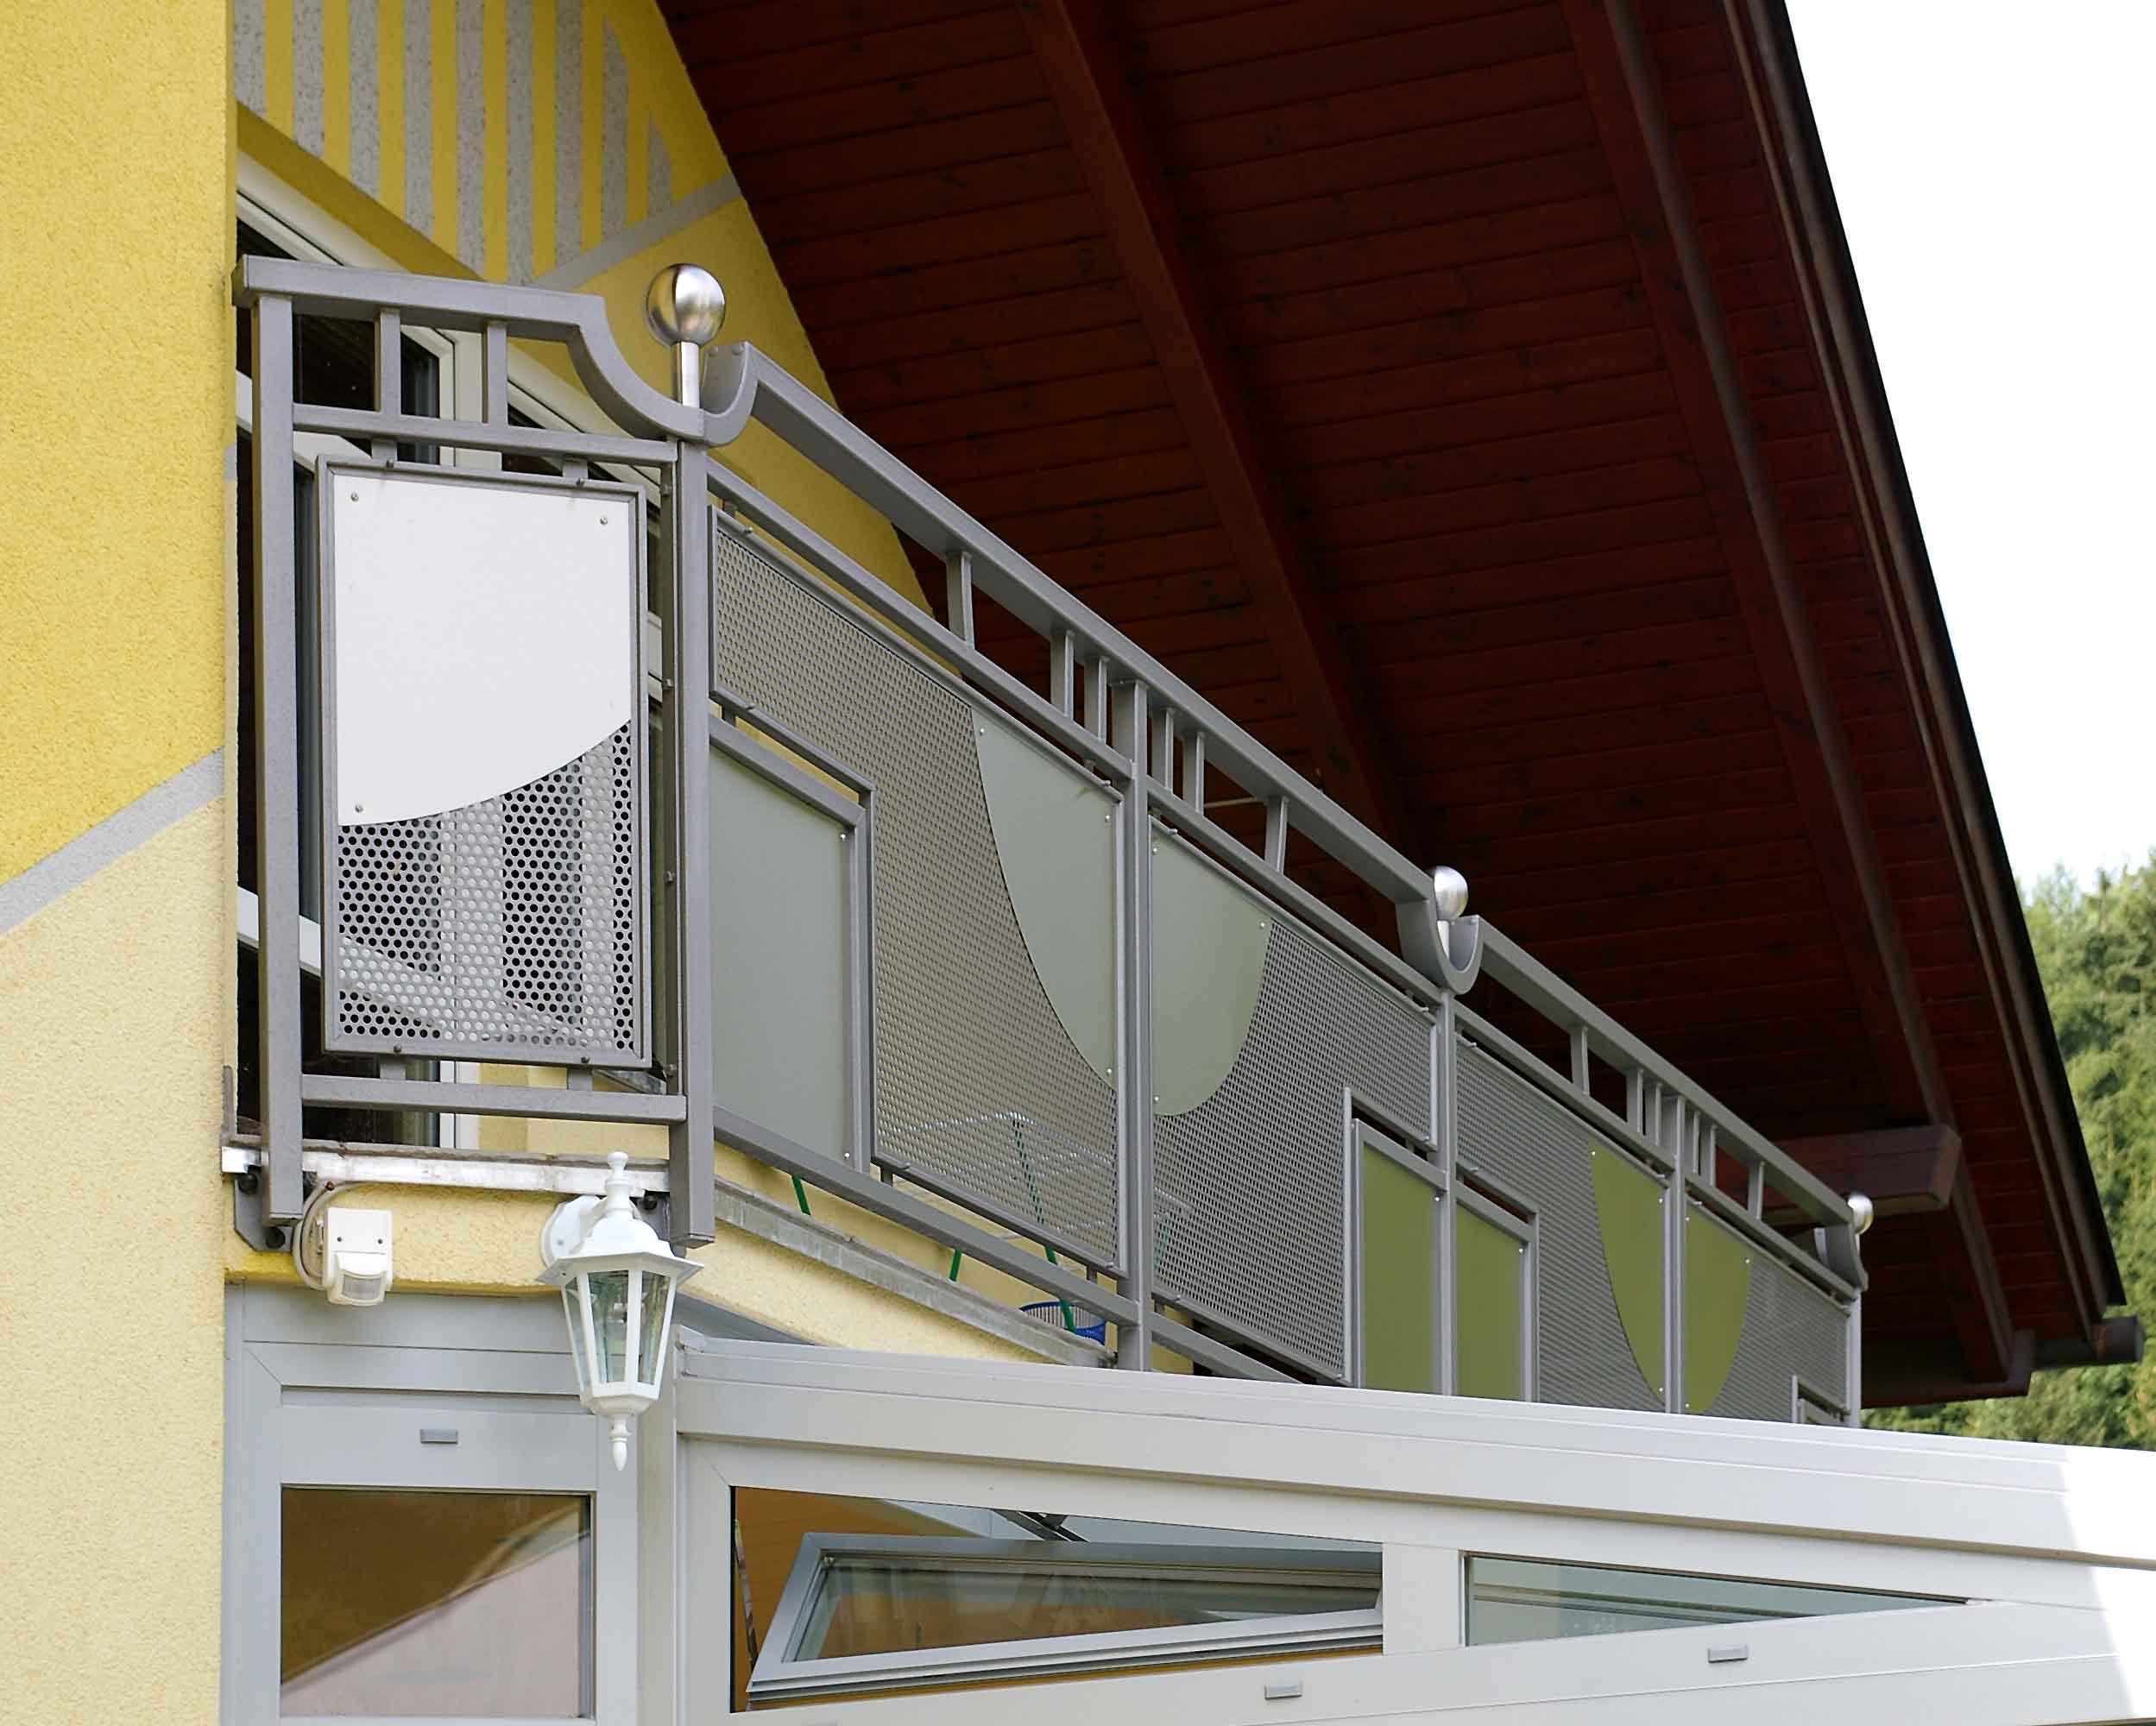 gl1127 balkongelaender lochblech oben schraeg. Black Bedroom Furniture Sets. Home Design Ideas